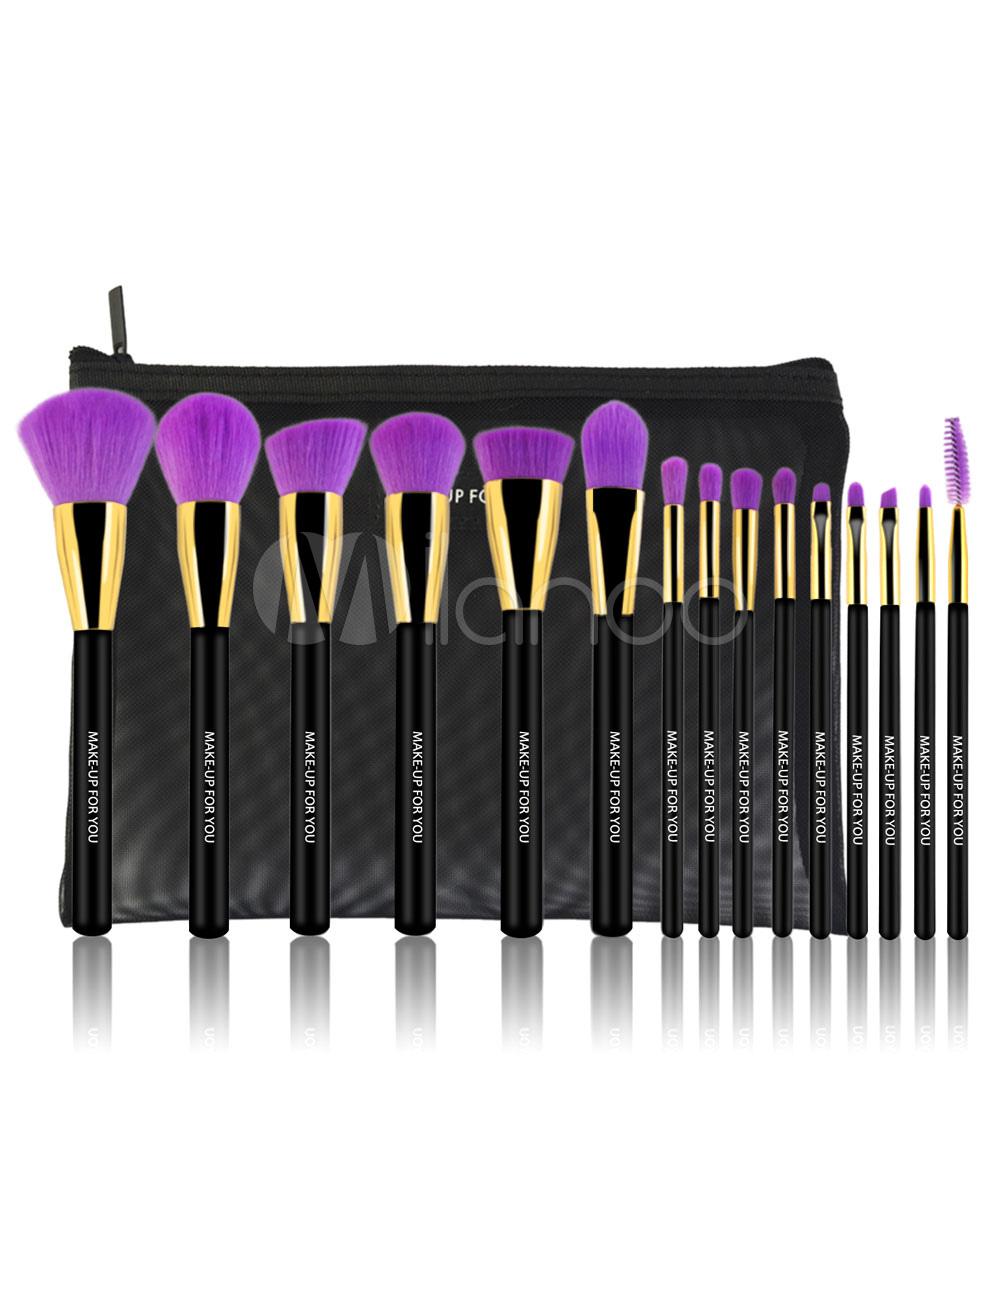 Black Makeup Brush Set Women's Microfiber Makeup Brushes In 15 Piece Set